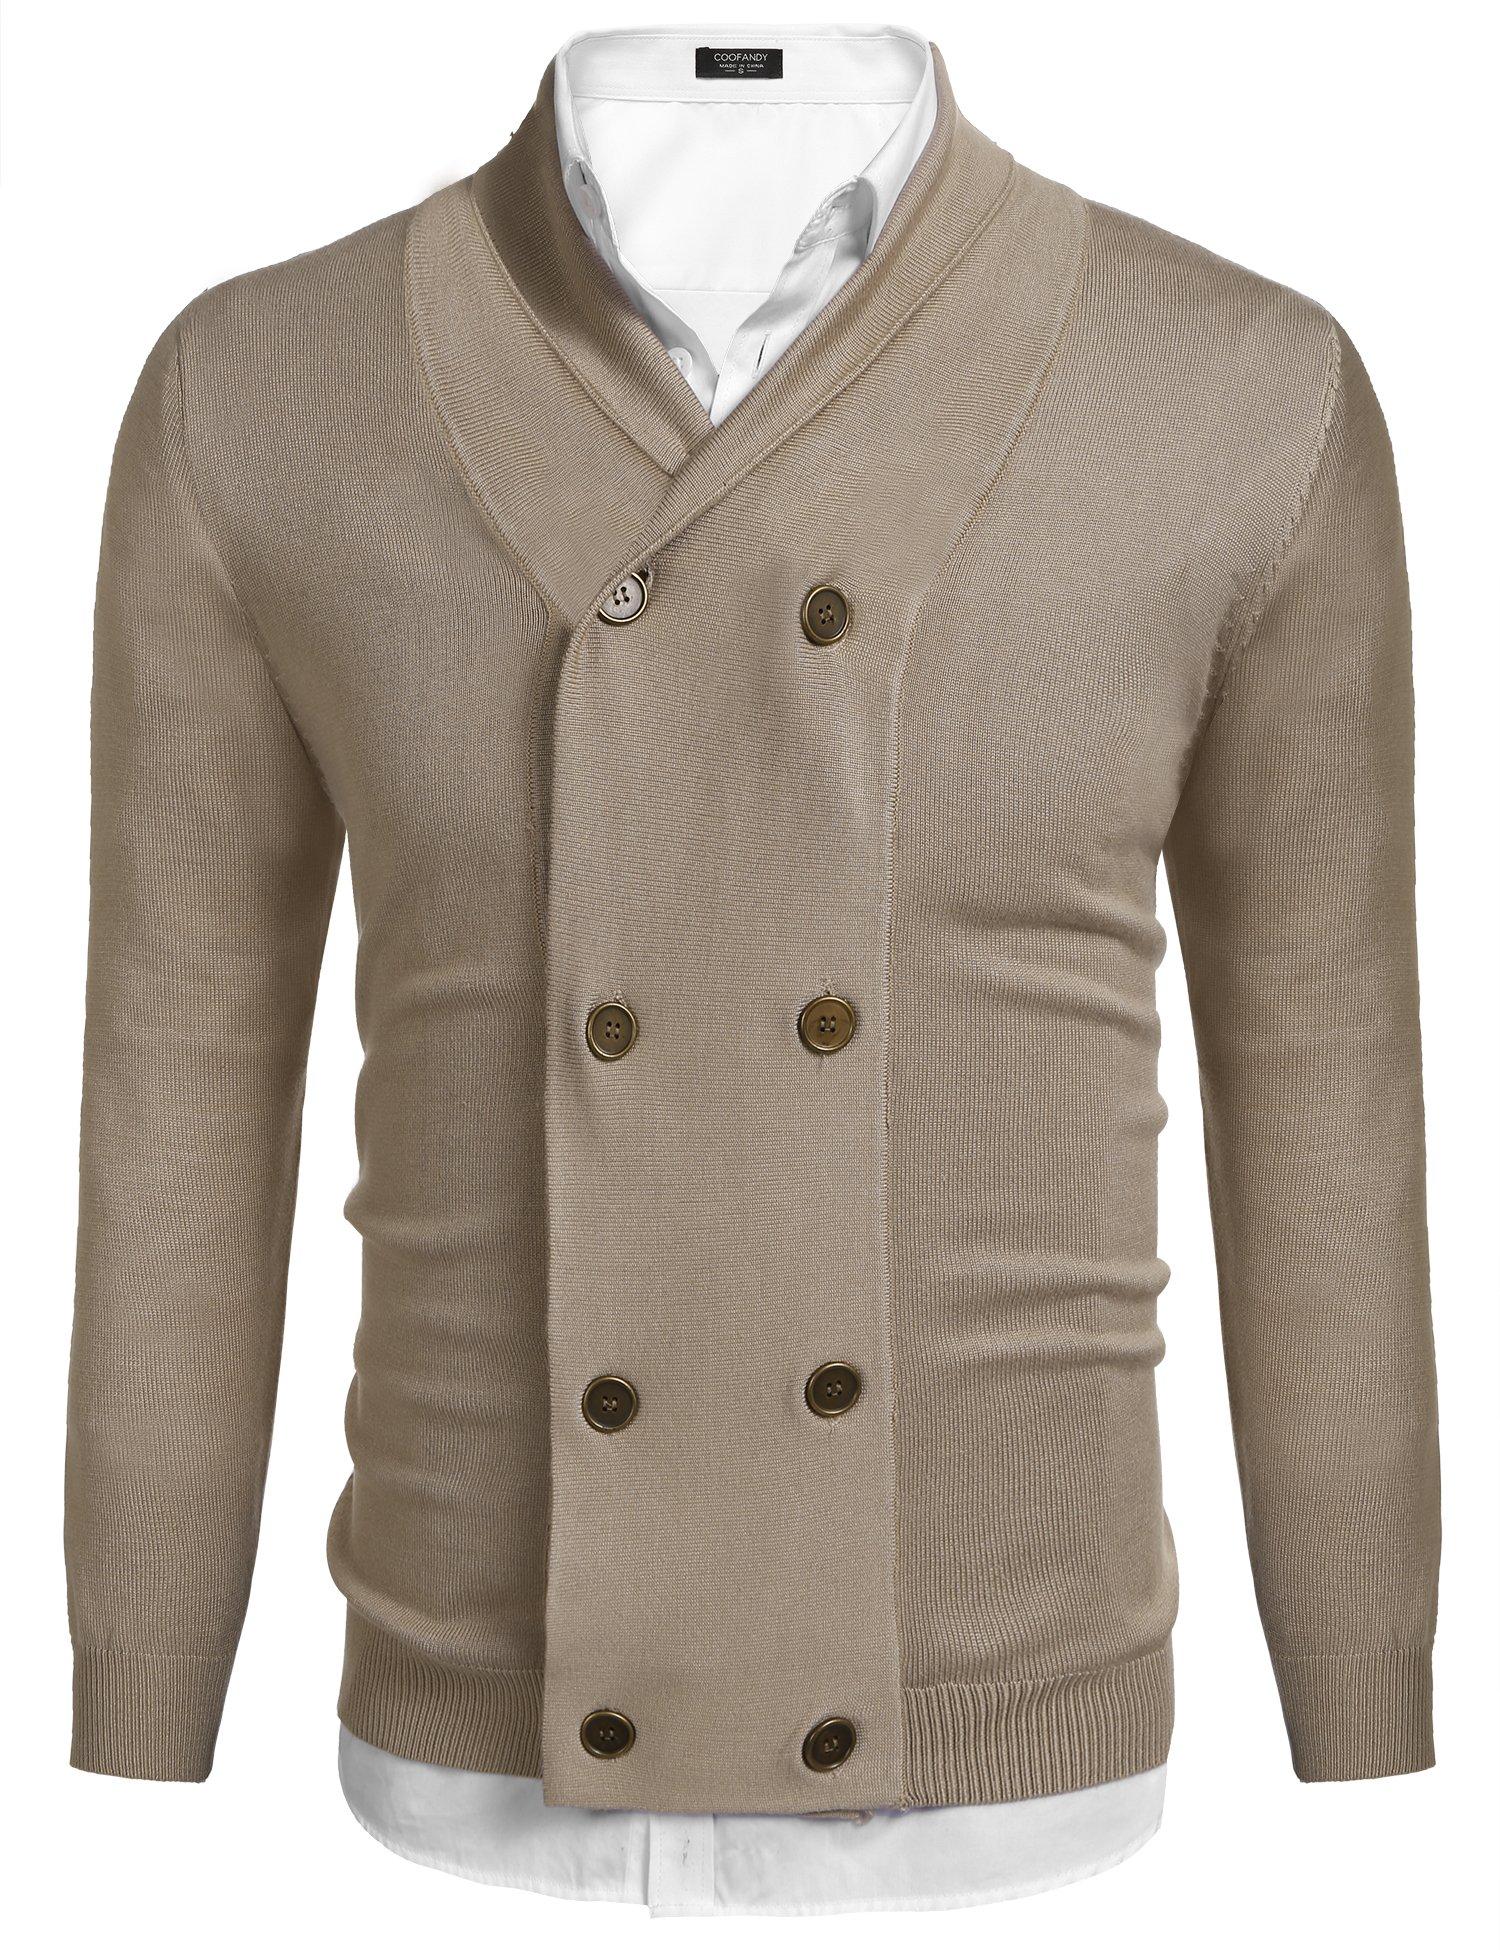 Coofandy Mens Slim Fit V-Neck Shawl Collar Cardigan Sweaters With Ribbing Edge